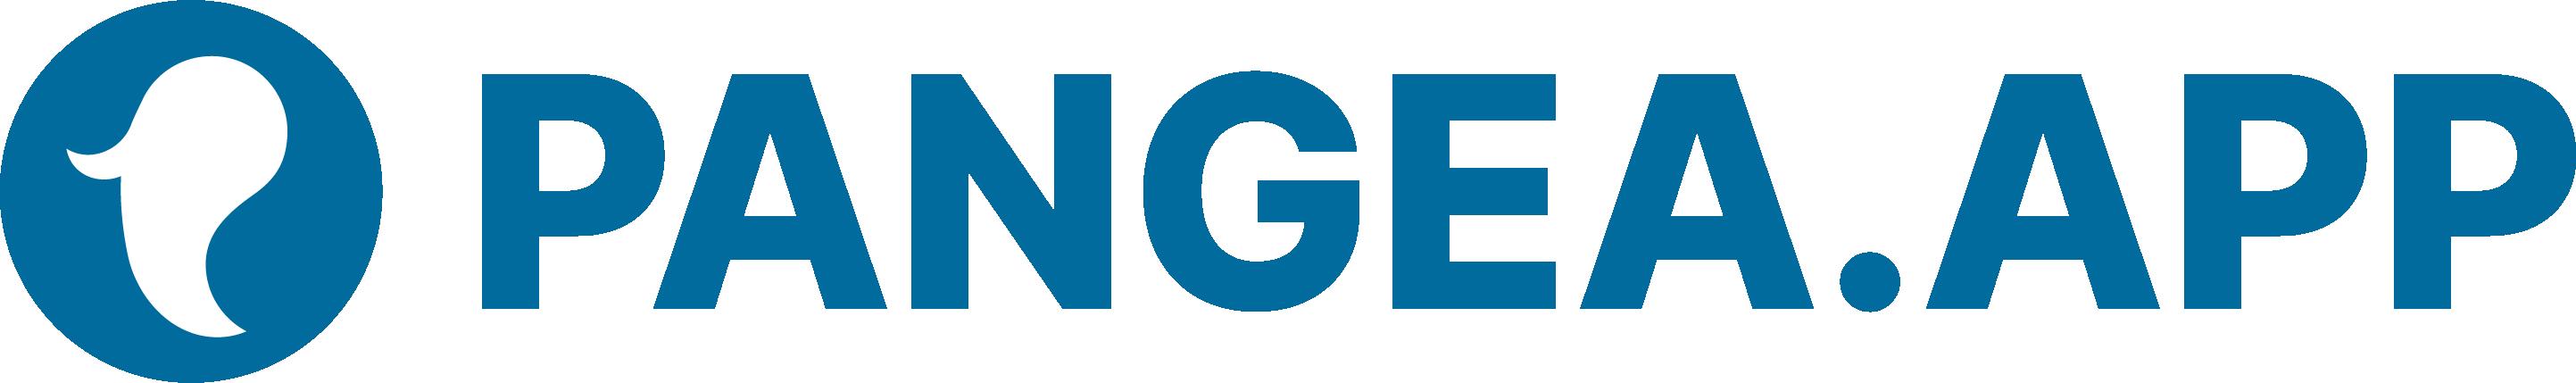 Pangea.app